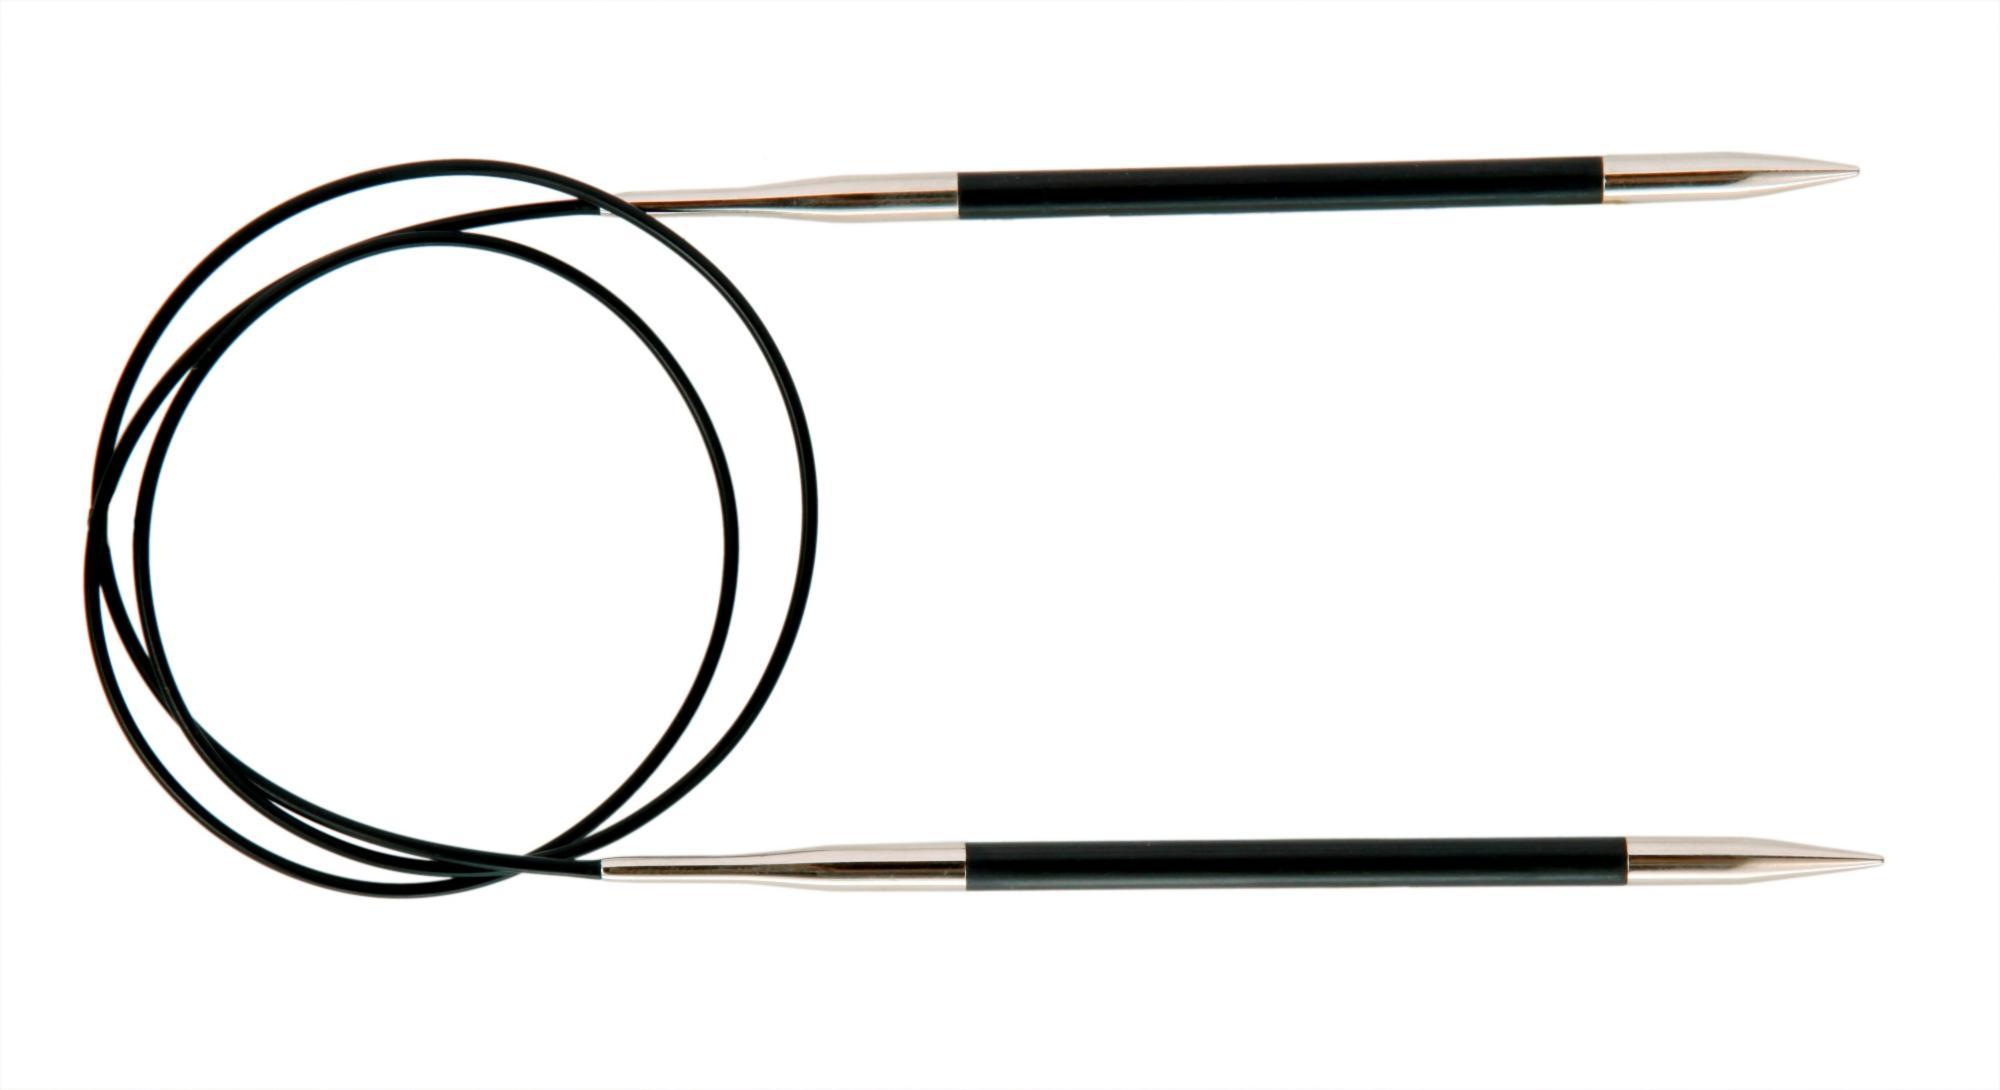 Спицы круговые 100 см Karbonz KnitPro, 41210, 4.50 мм